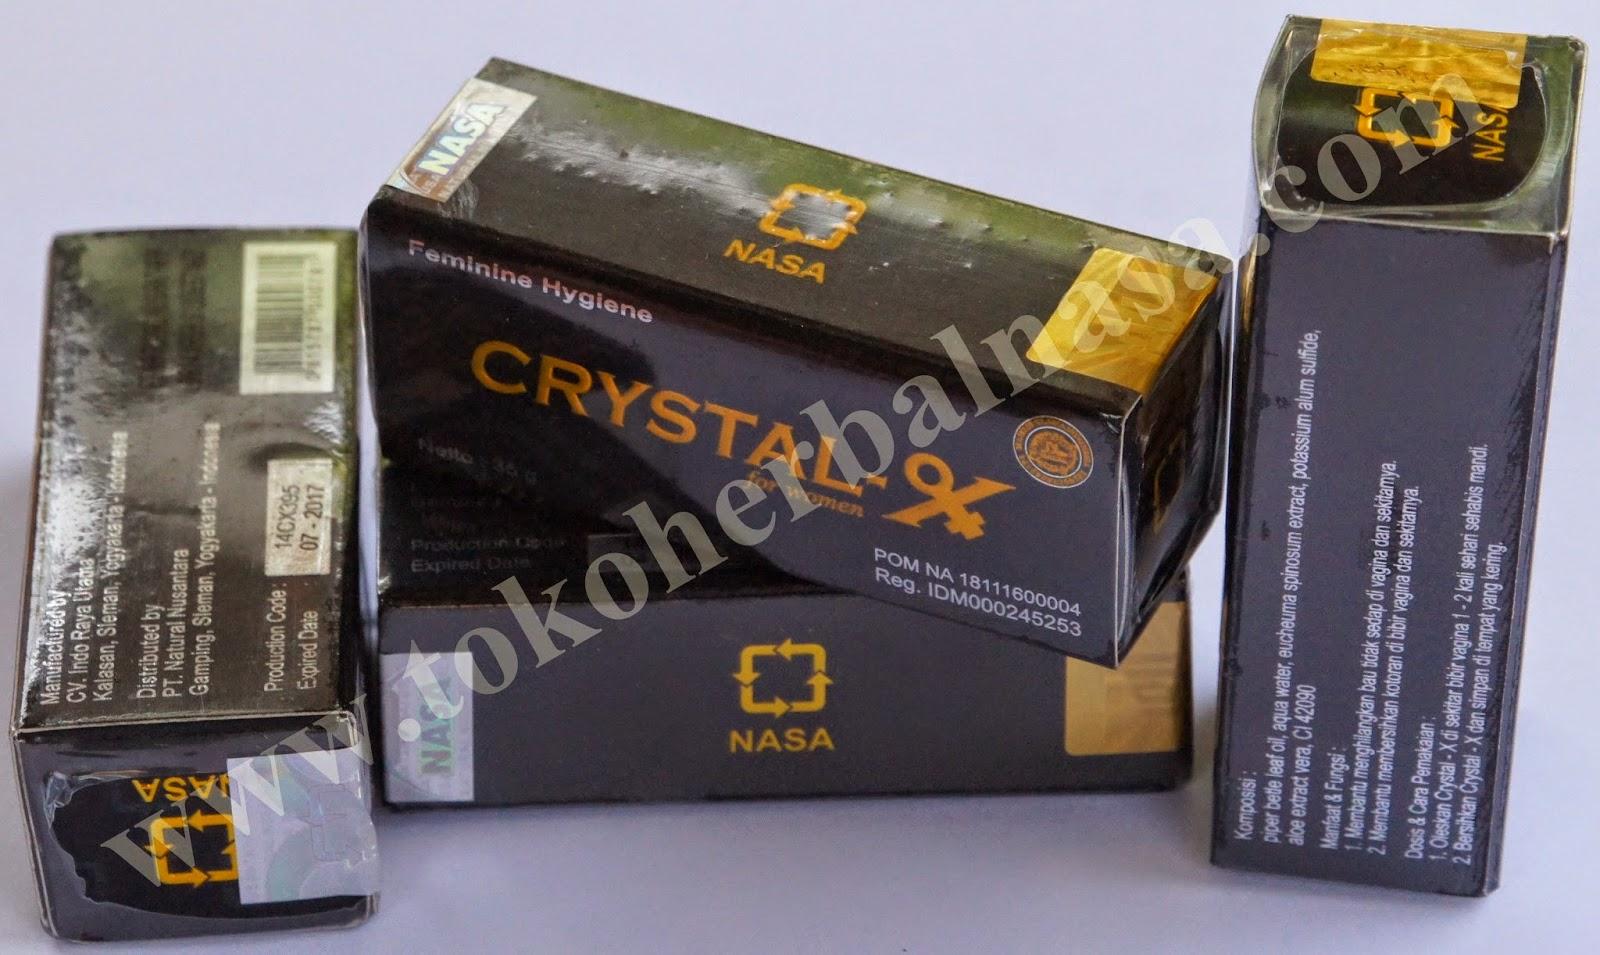 Manfaat-lengkap-crystalx